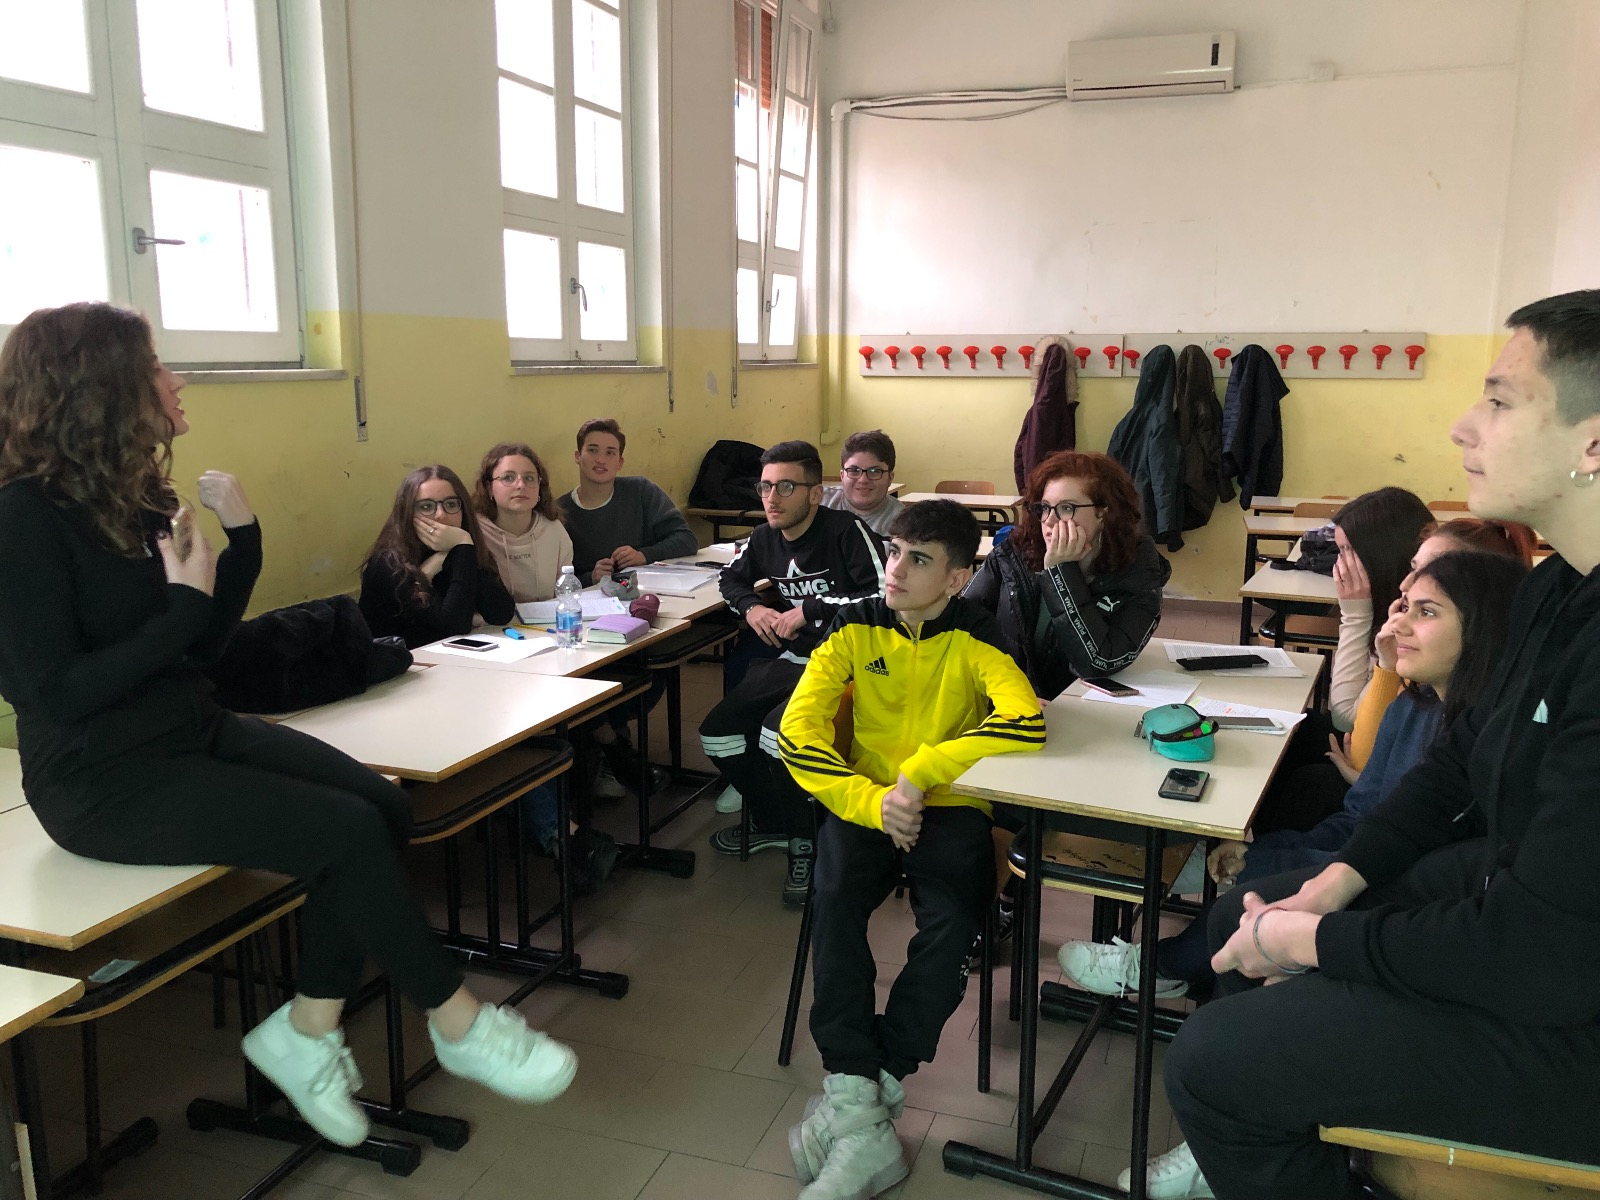 MEP - SESSIONE DI ISTITUTO 2019